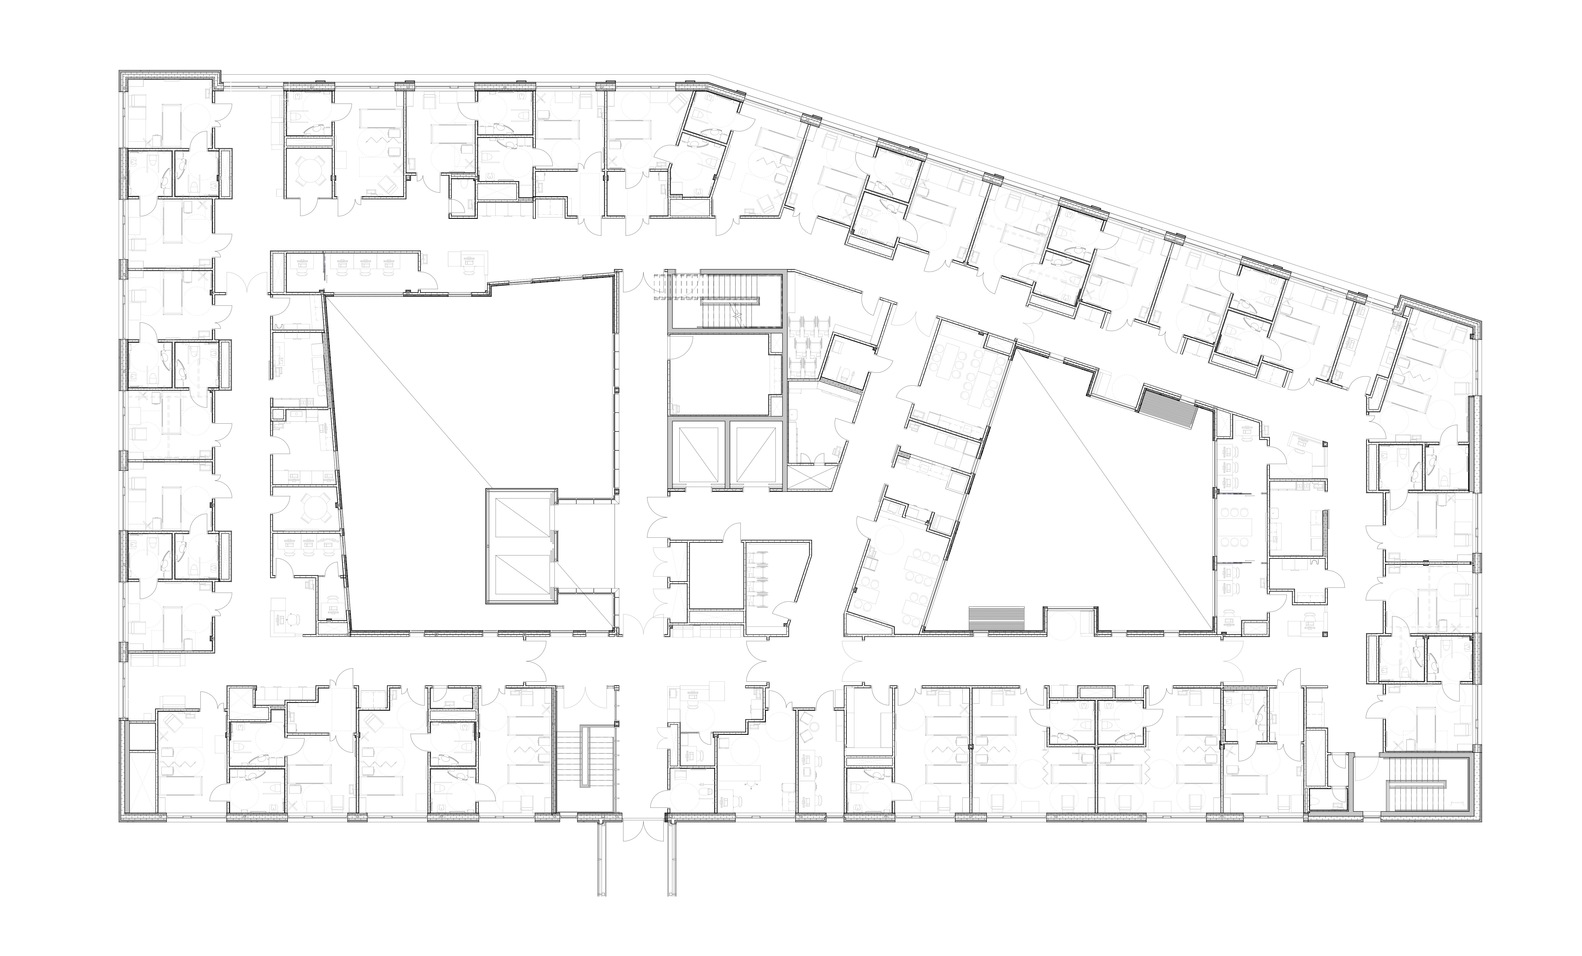 haraldsplass hospital c f m ller architects floor plan [ 1582 x 956 Pixel ]